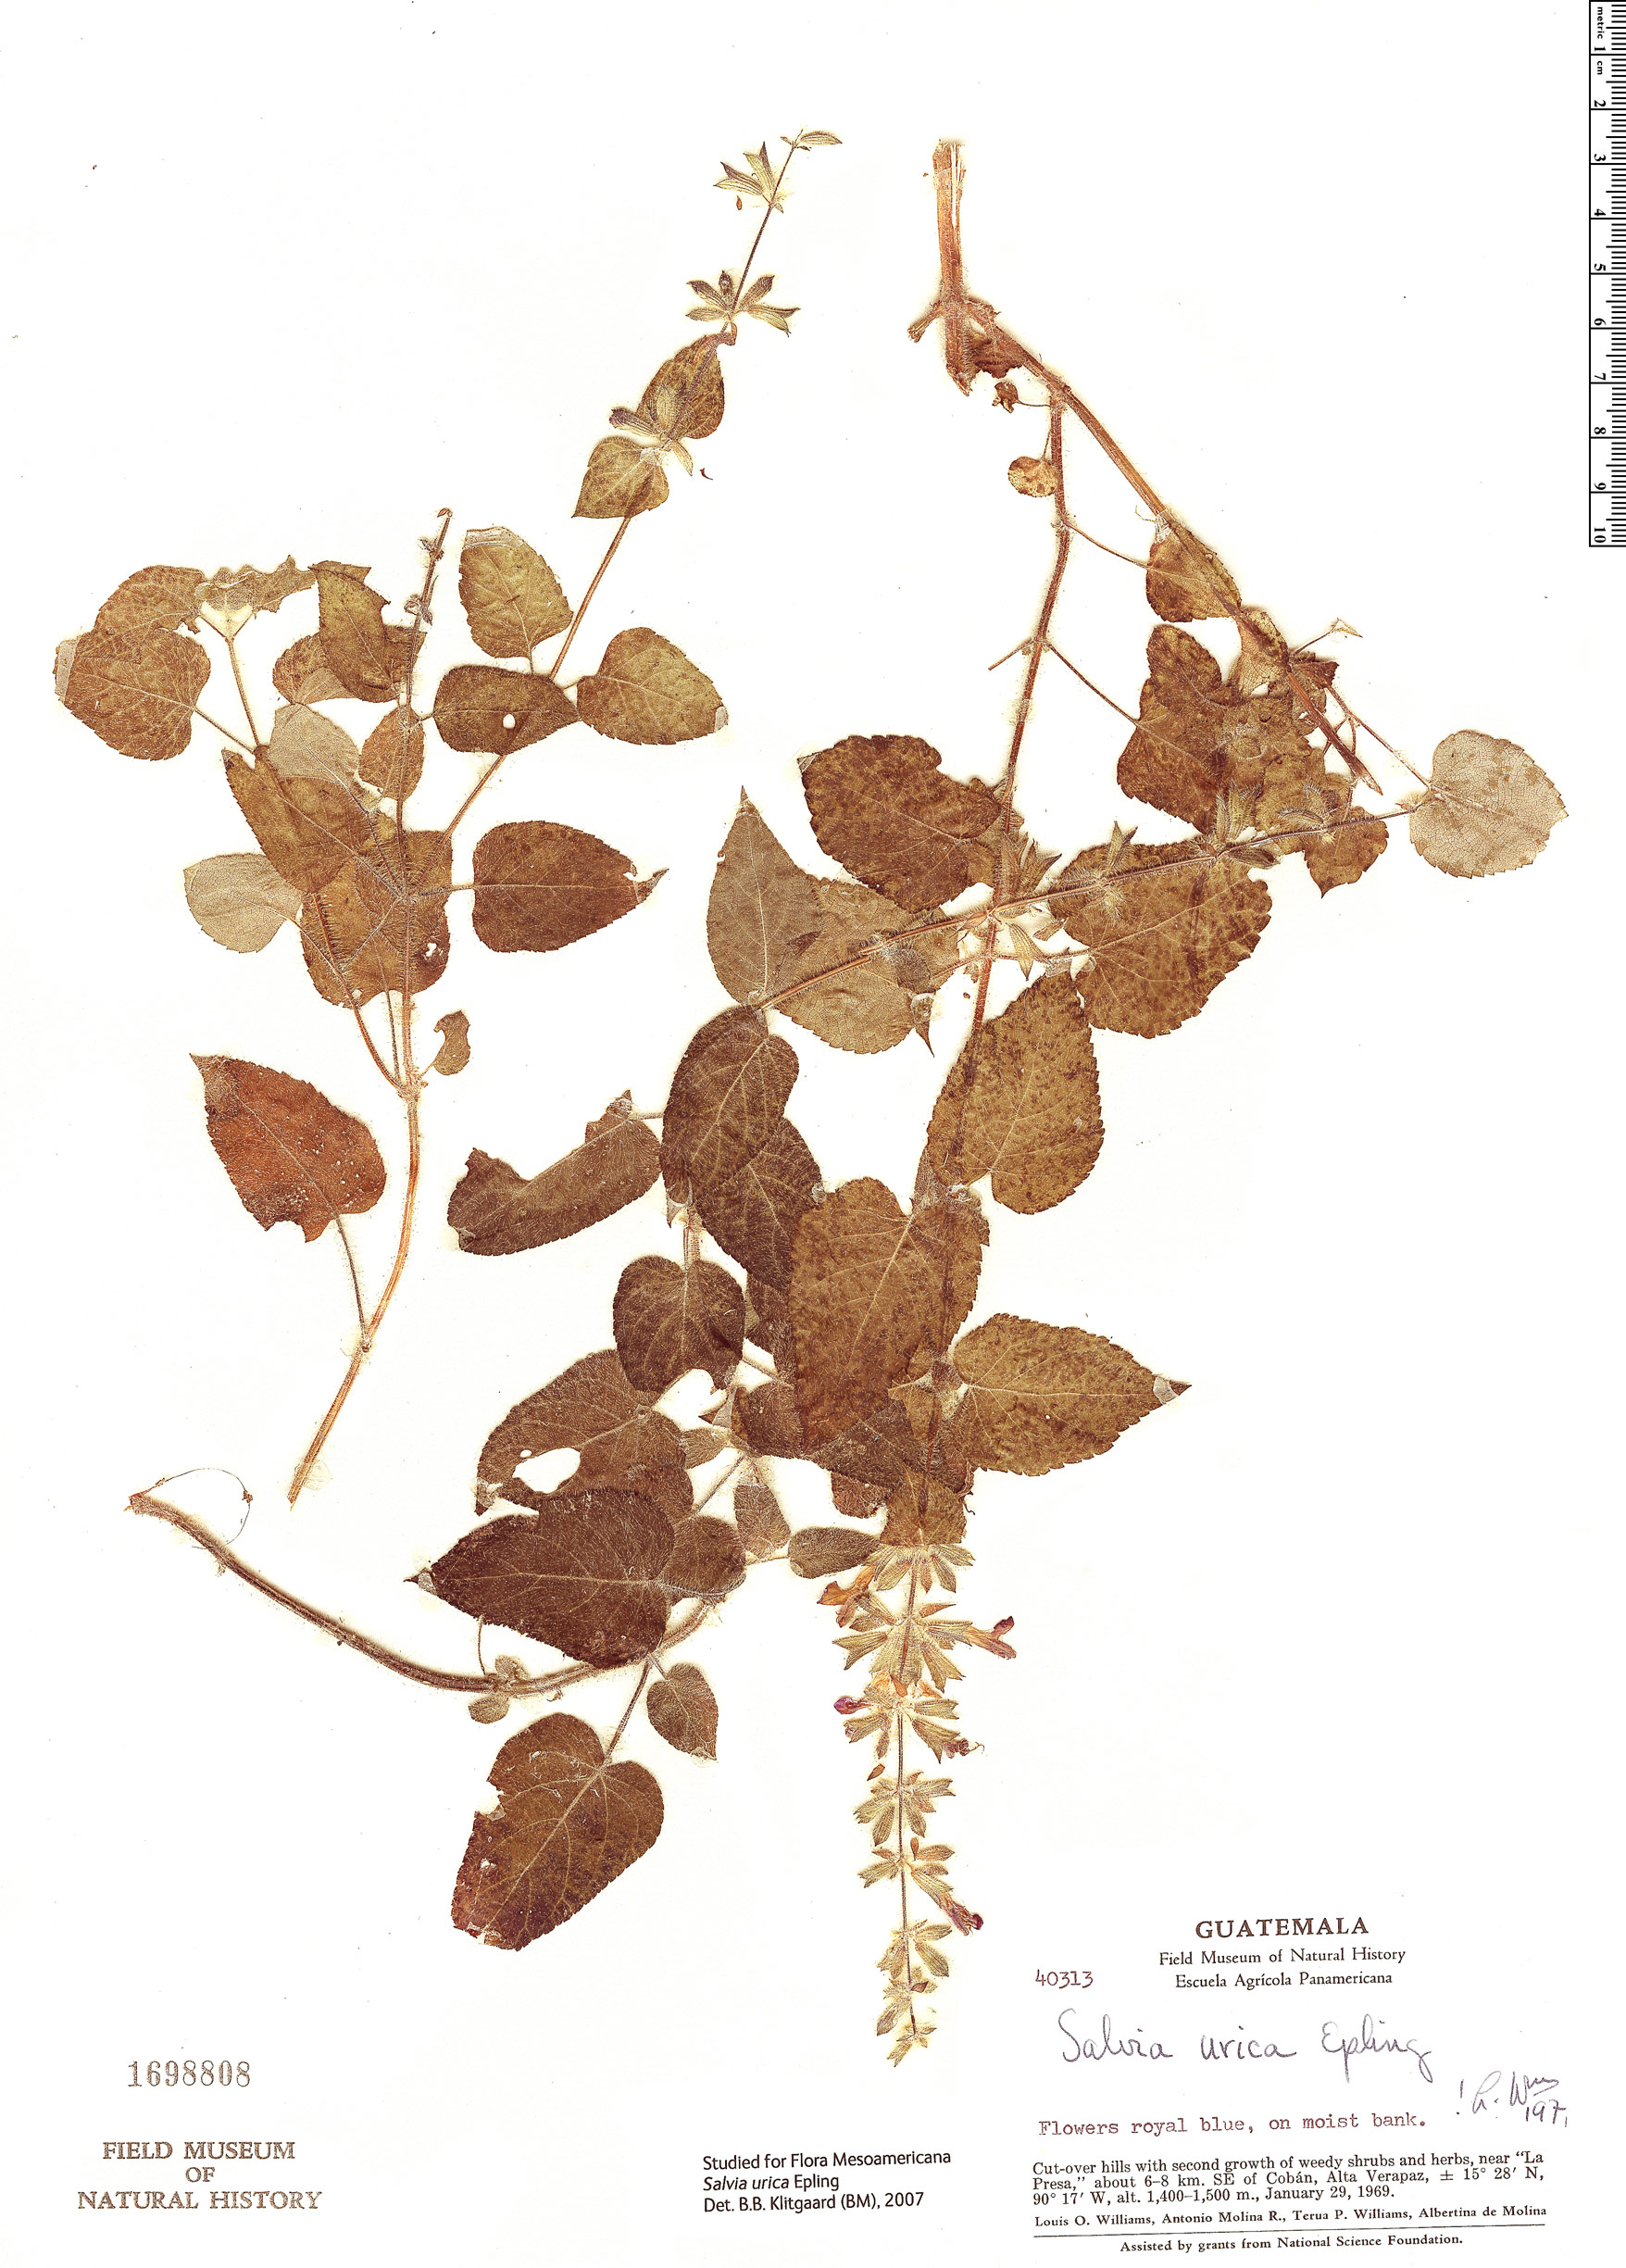 Specimen: Salvia urica